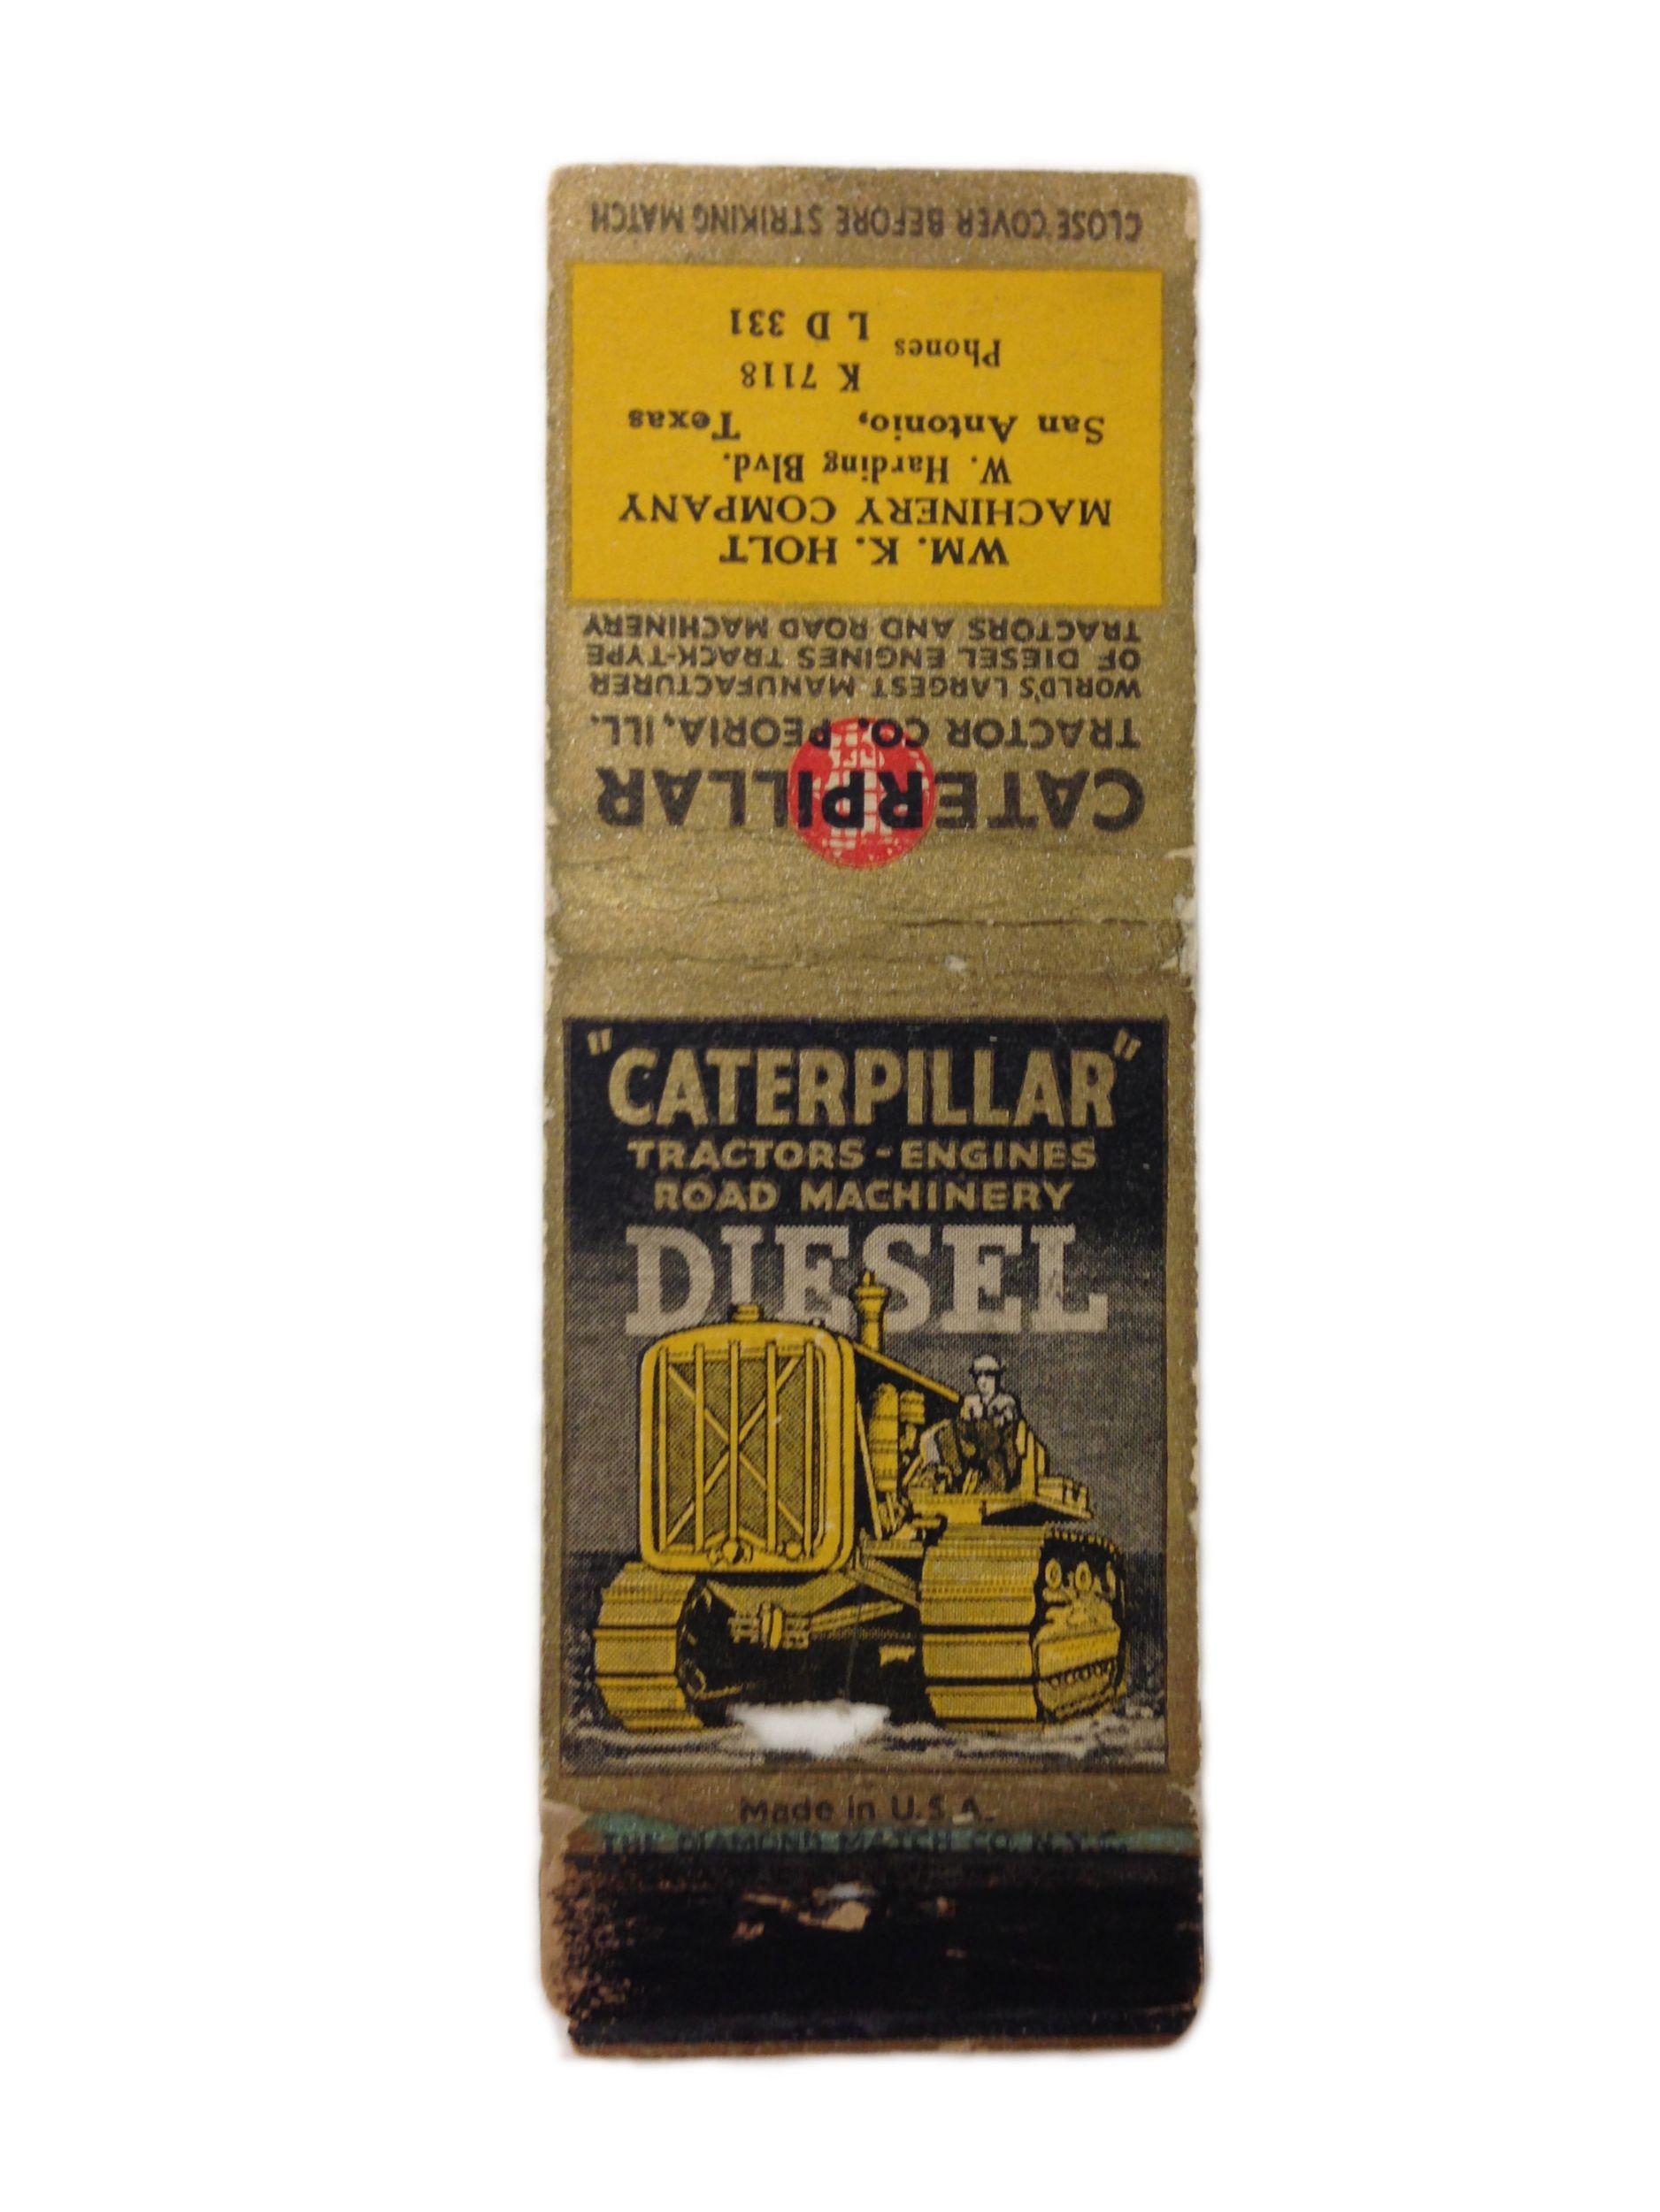 caterpillar d6 serial number location